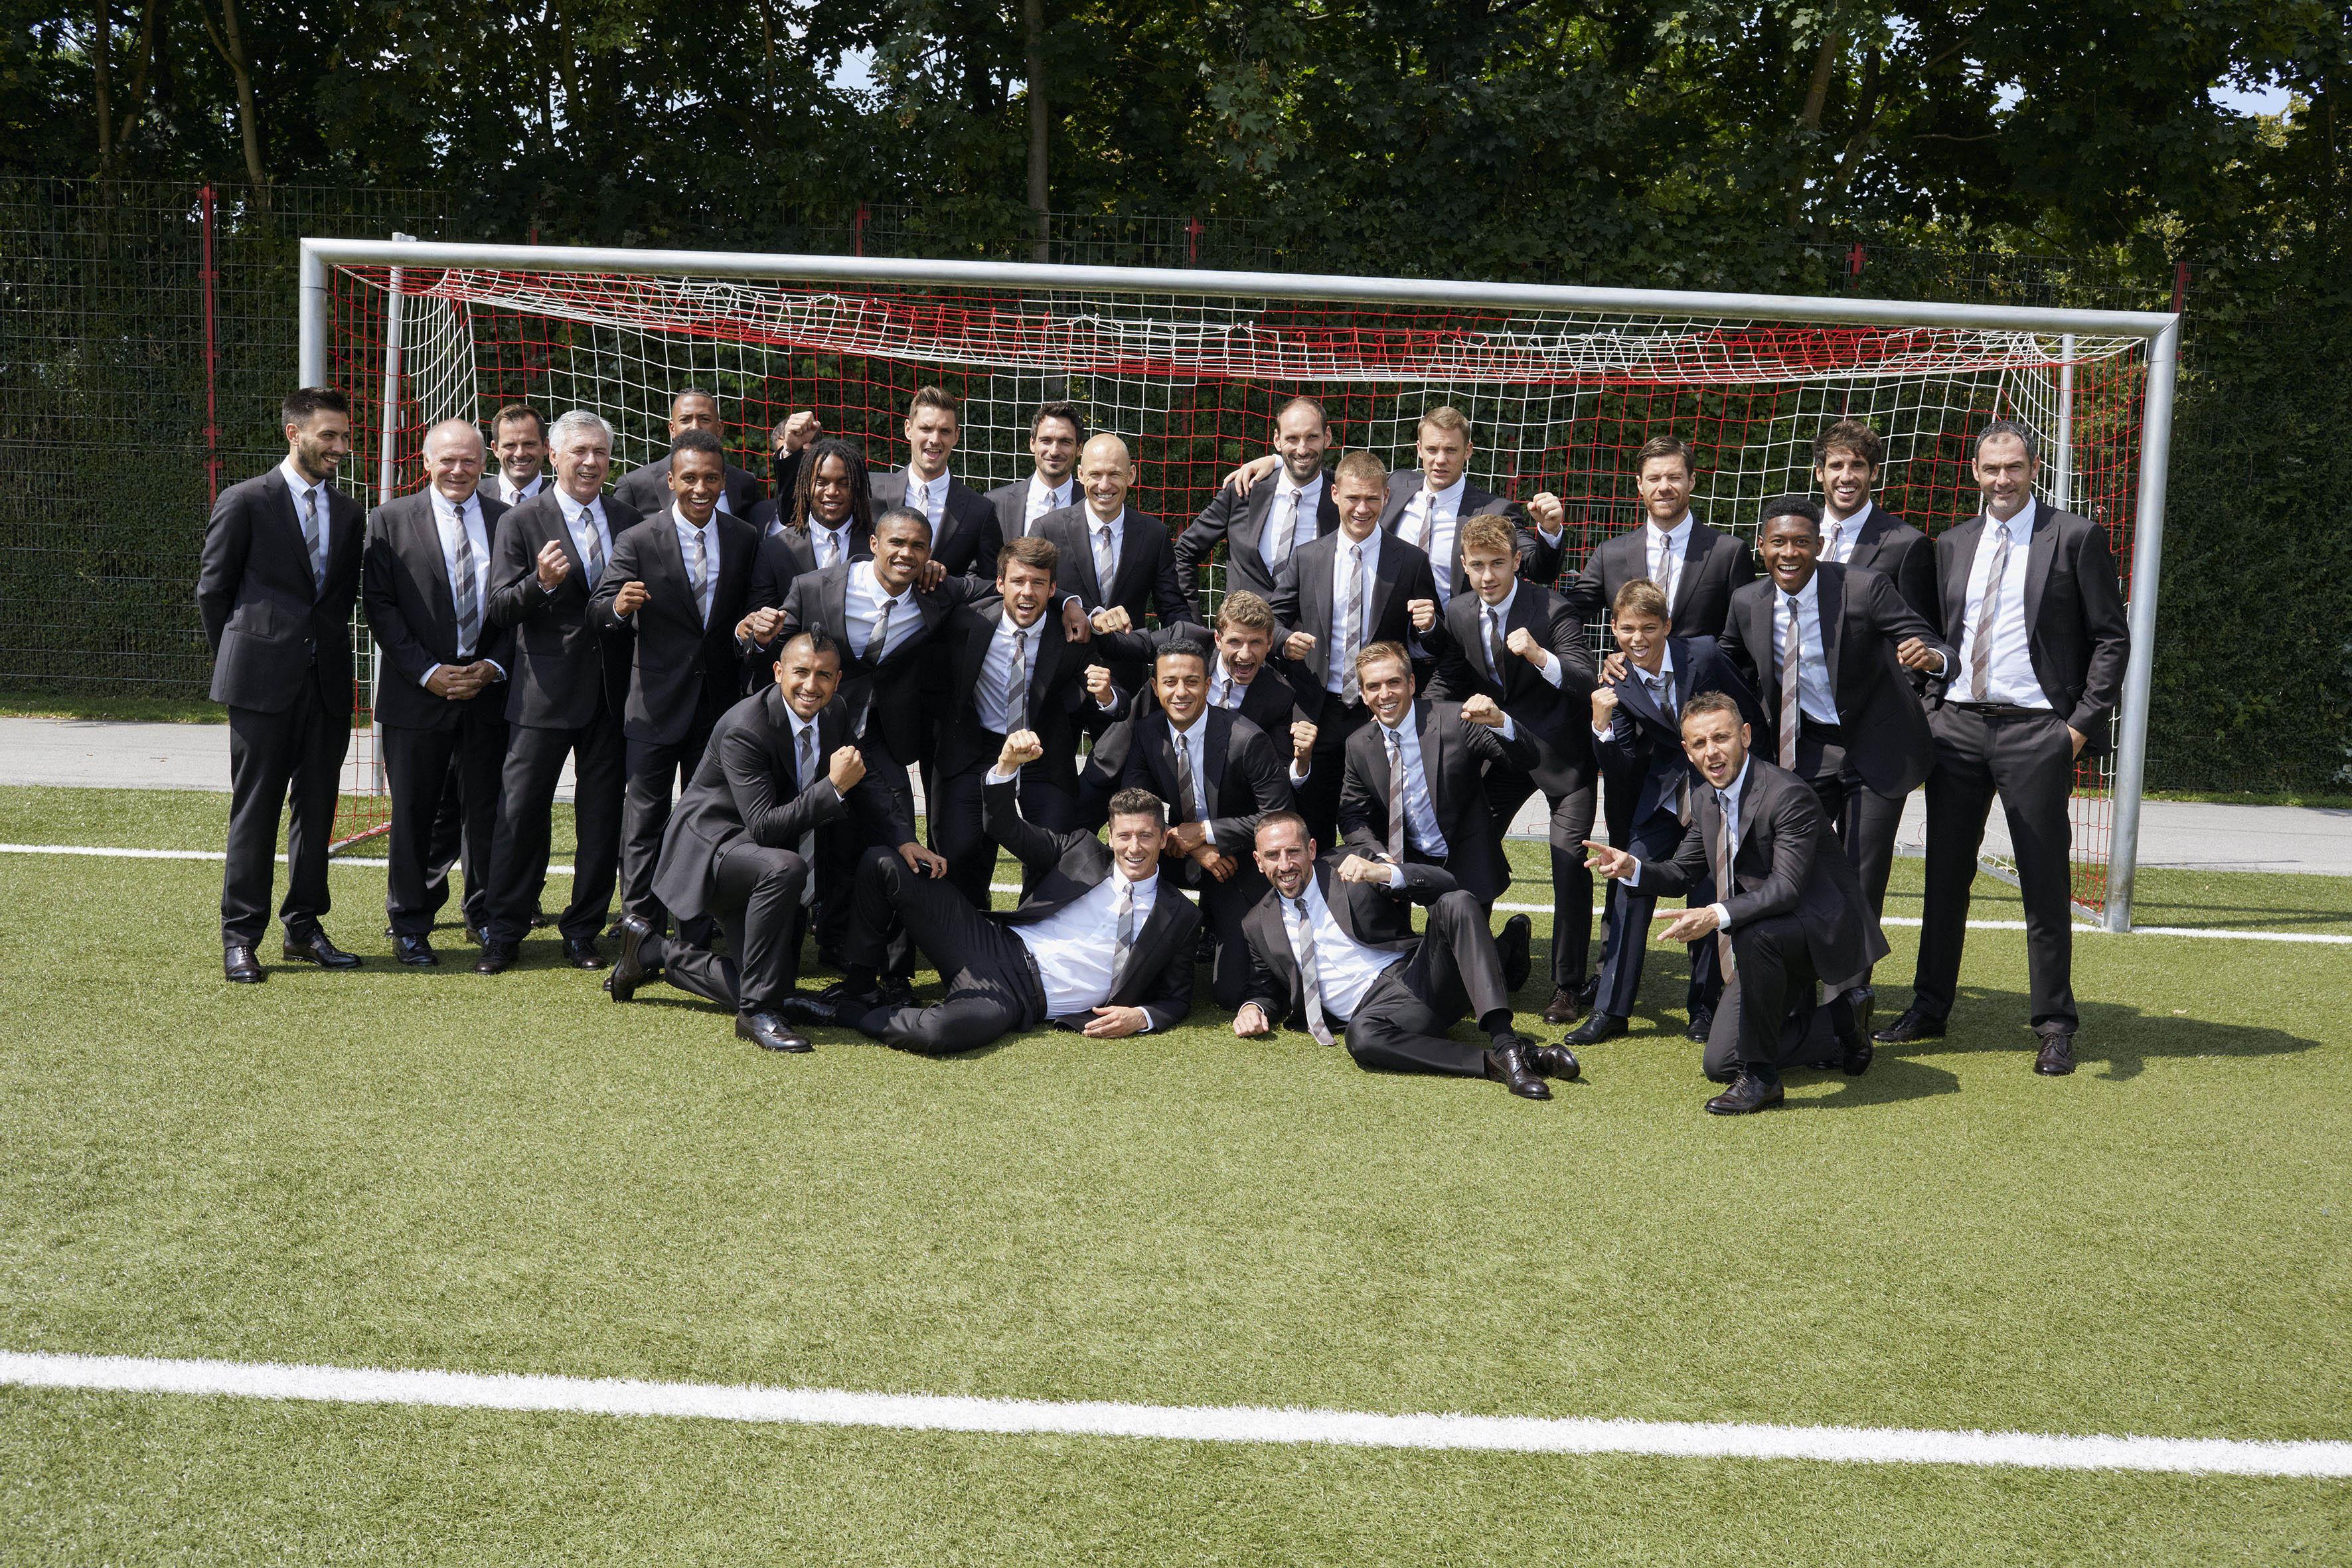 The official team photo shot by Juergen Teller